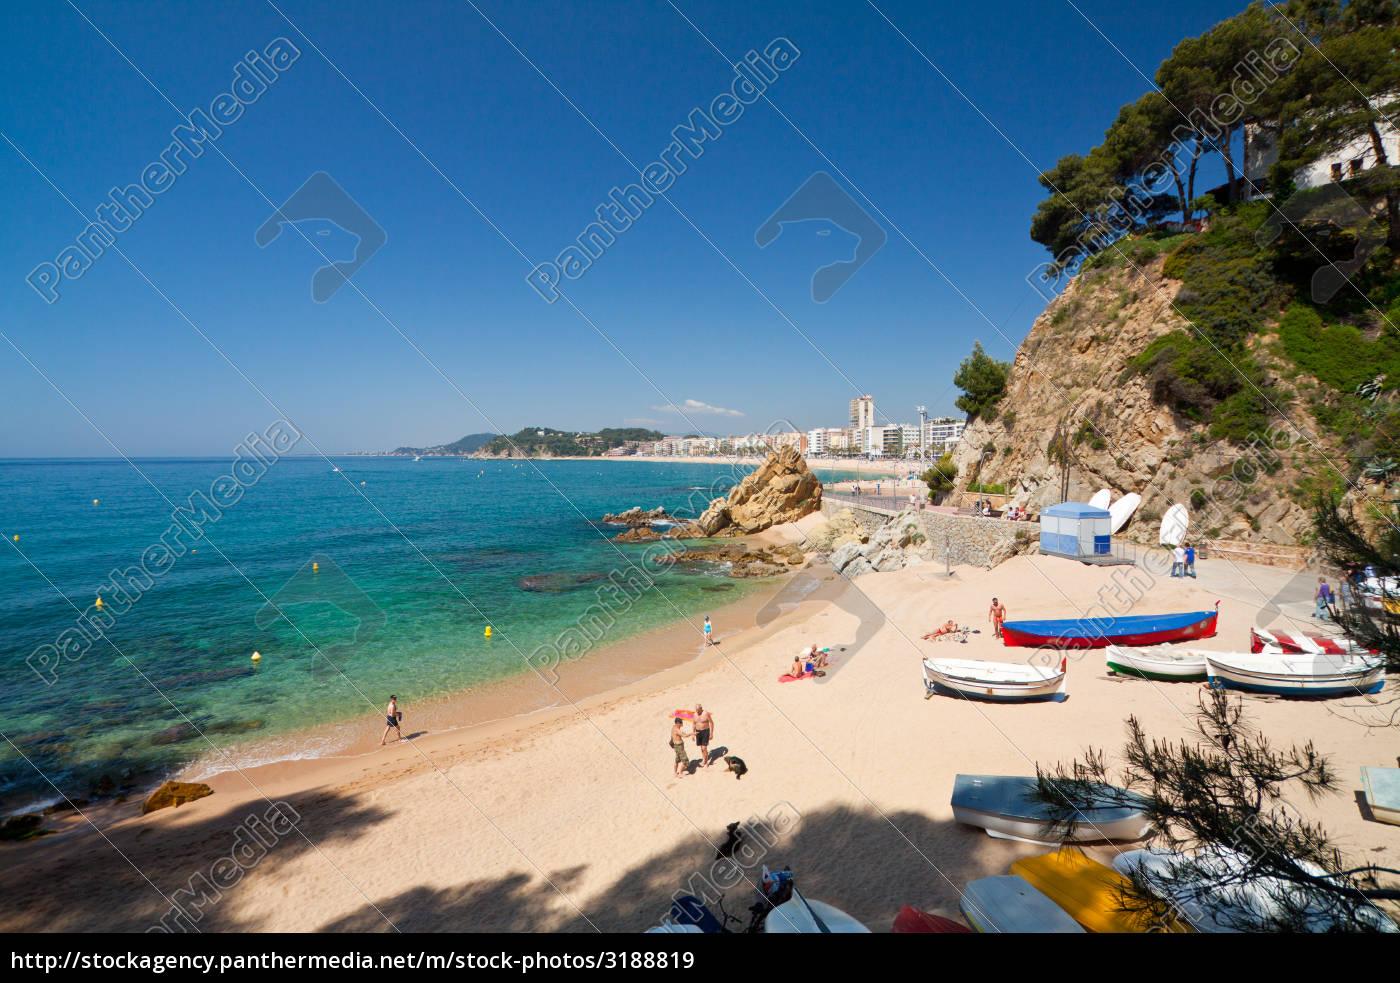 strand, lloret, spanien, boote - 3188819